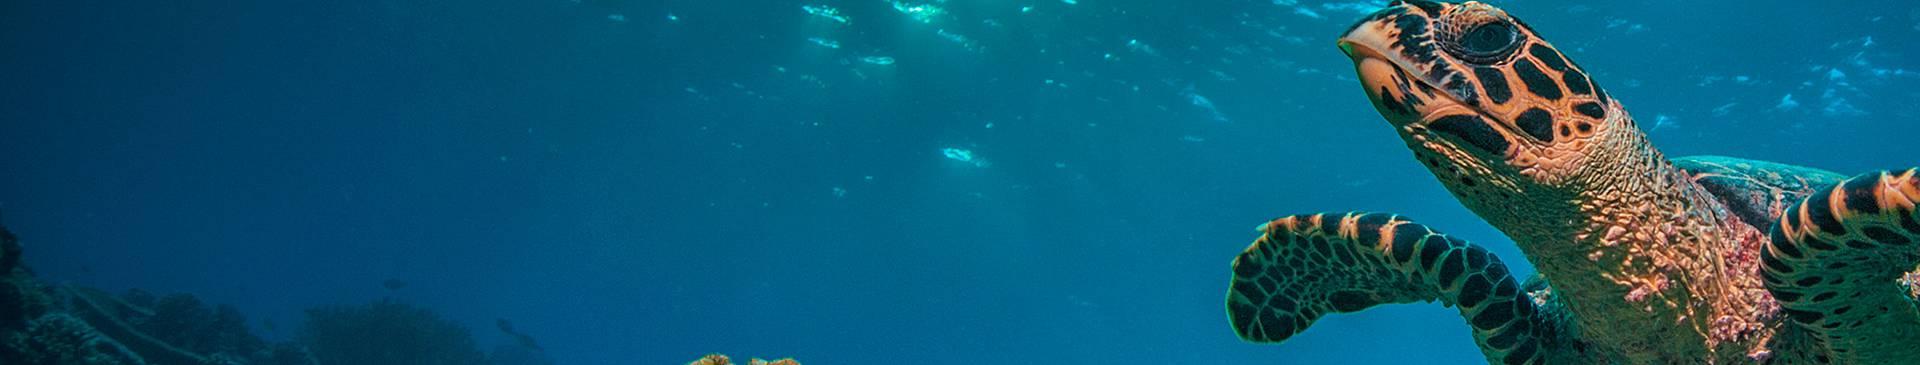 Snorkeling e immersioni alle Seychelles